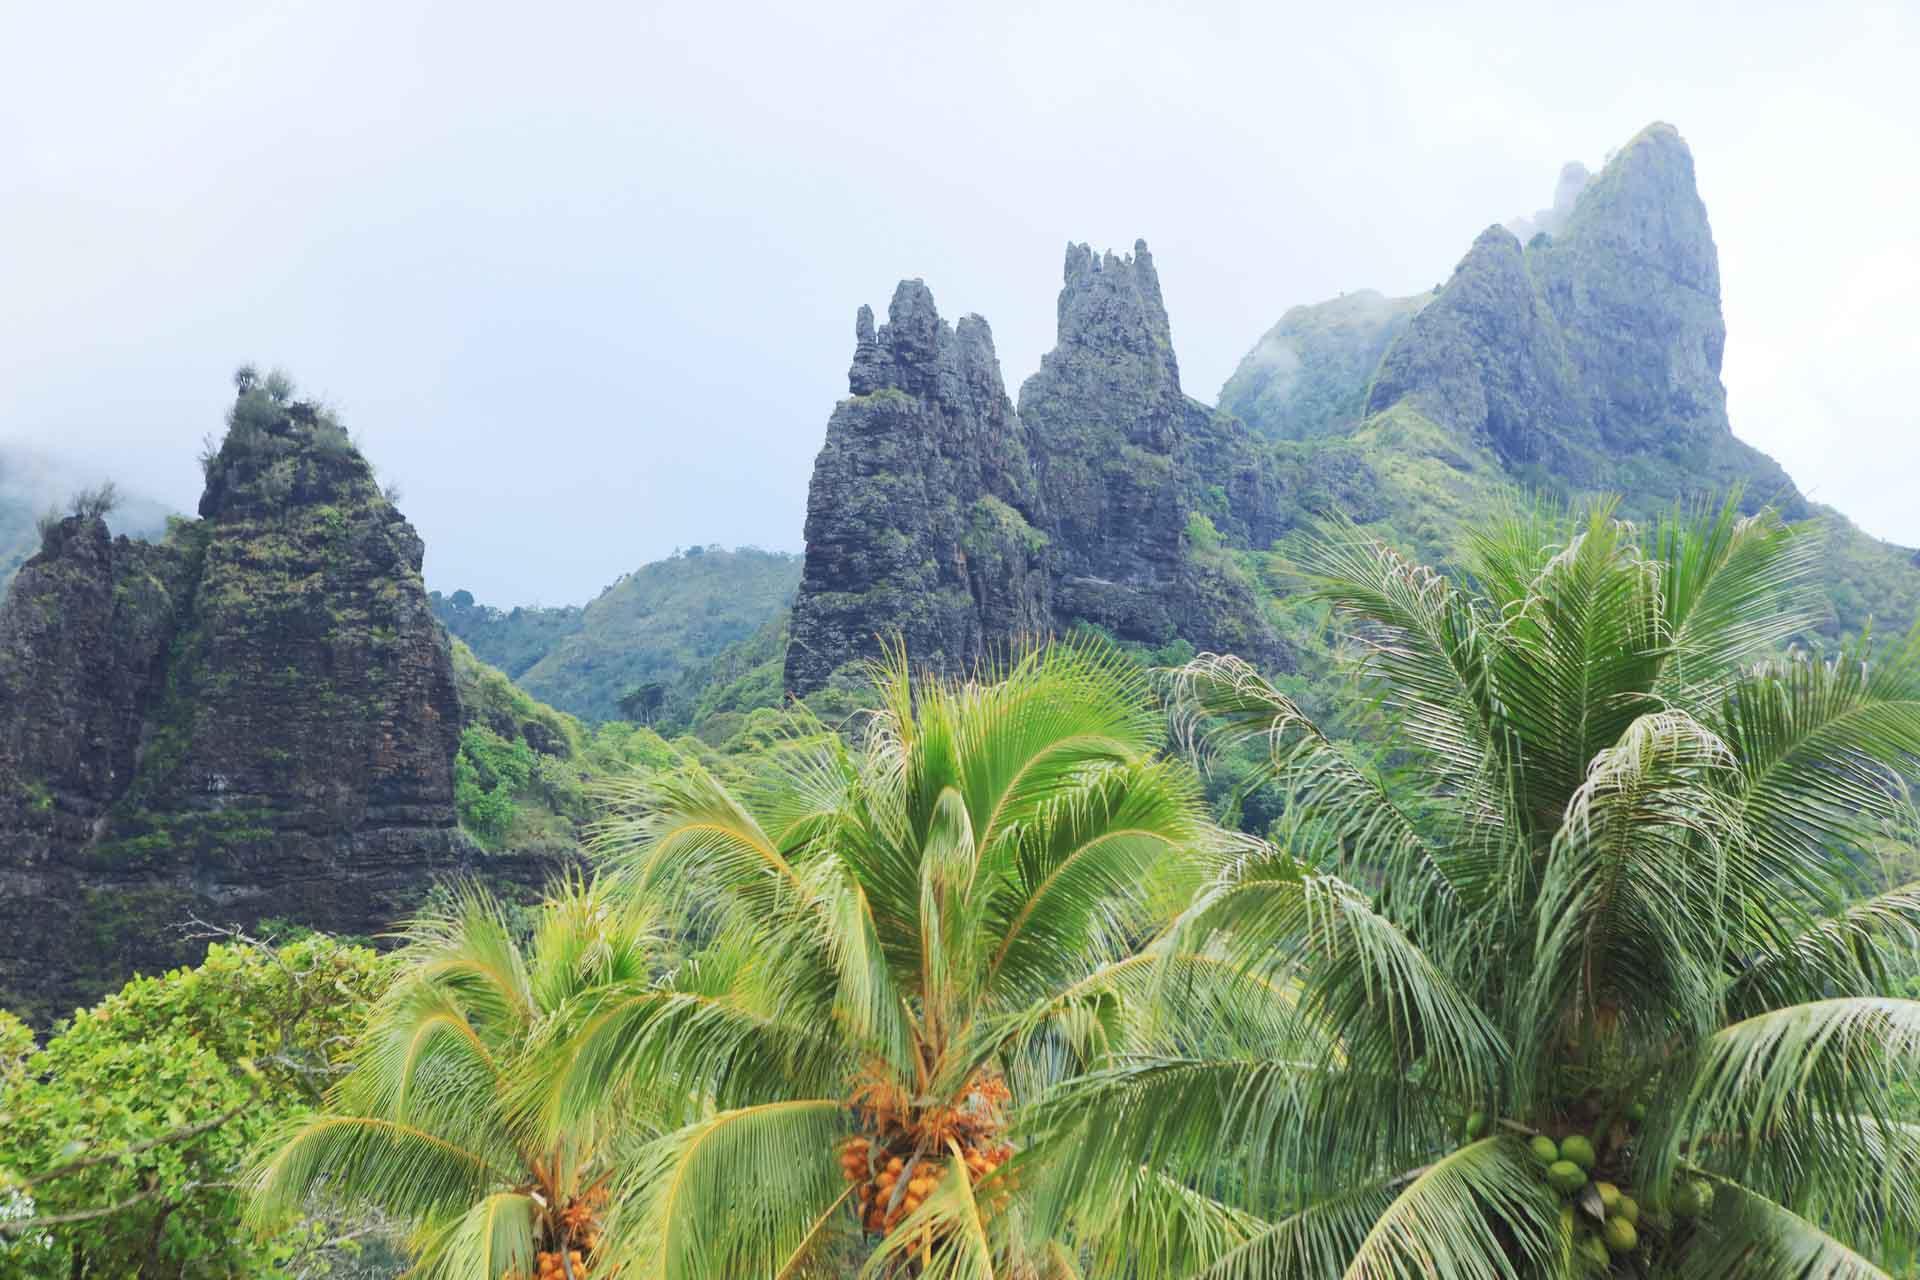 Les falaises de Nuku Hiva dressées vers le ciel © Tahiti Tourisme